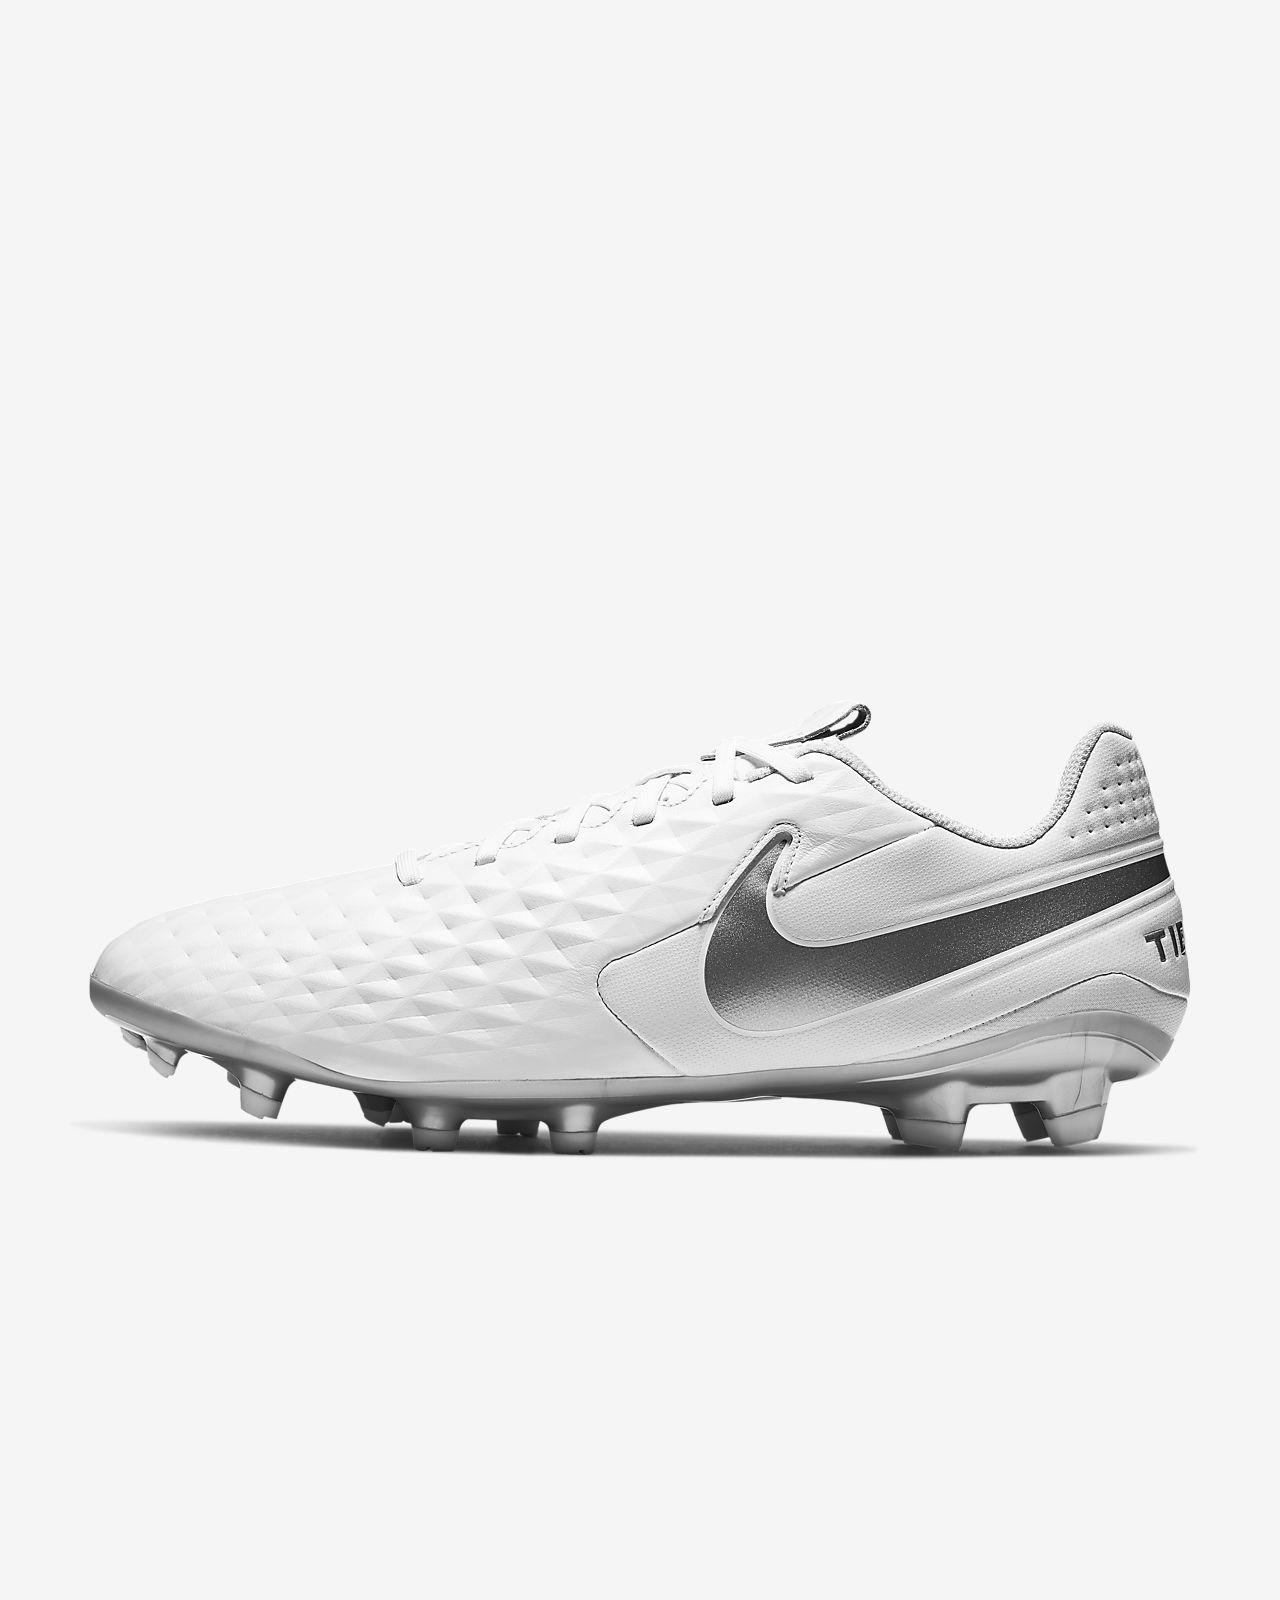 Calzado de fútbol para múltiples superficies Nike Tiempo Legend 8 Academy MG